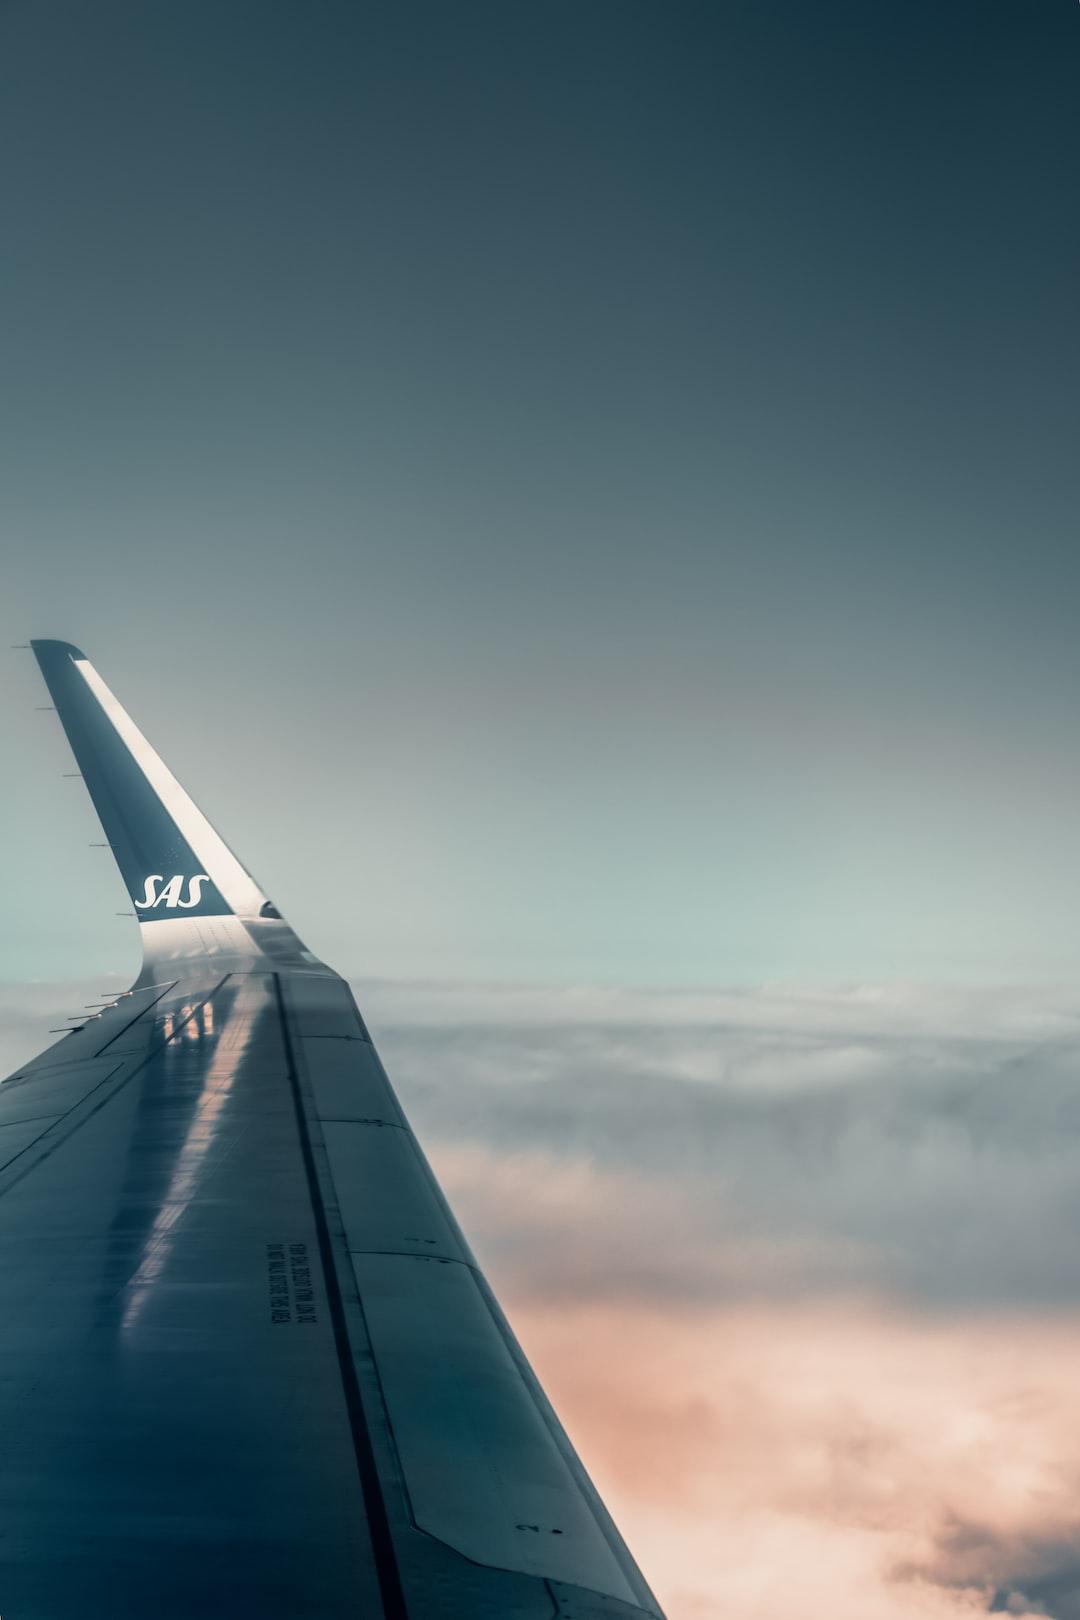 flight, plane, sas, blue, orange, air, skies, heaven, airplane